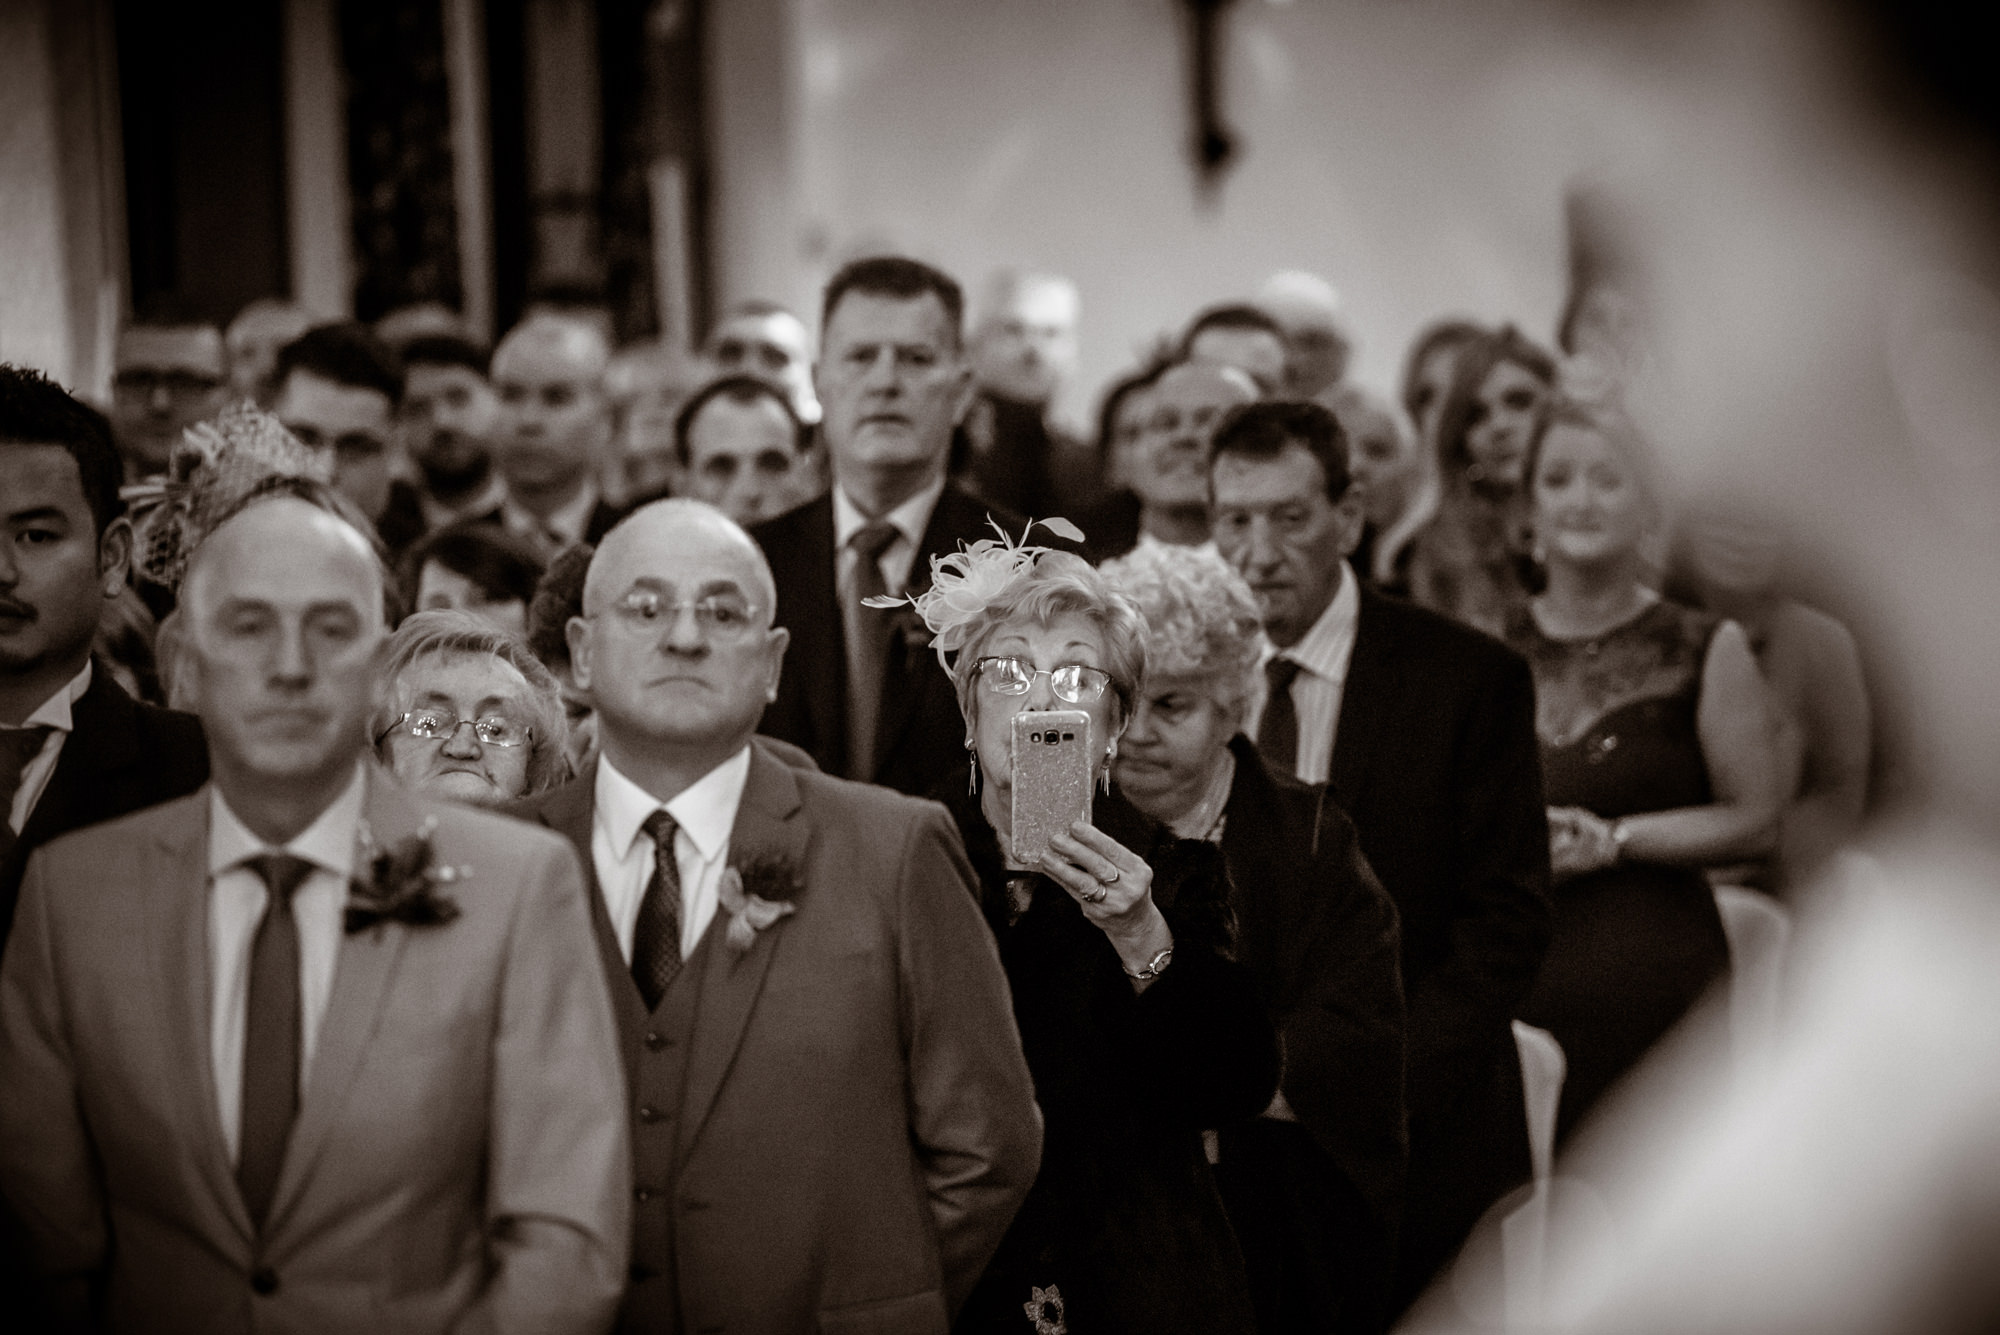 documentary-wedding-photographer-scotland (18).jpg